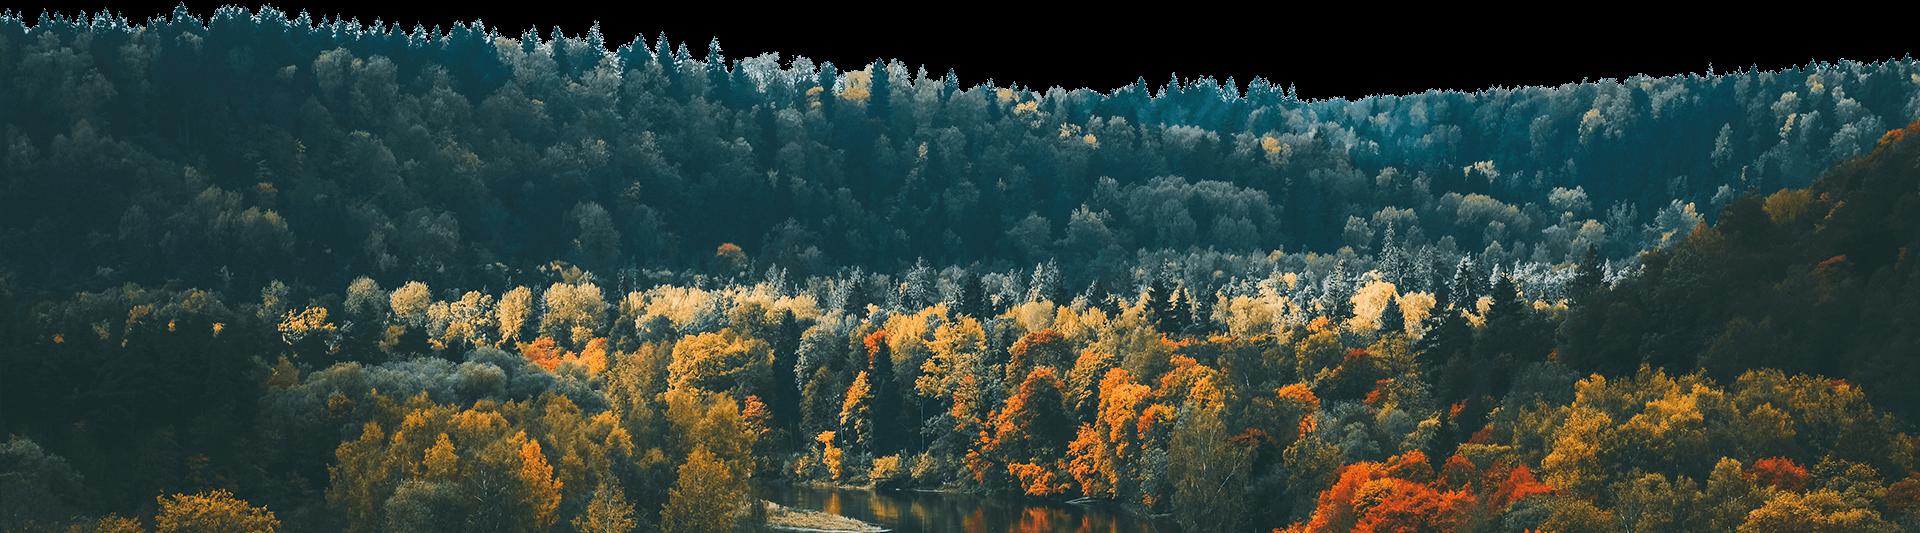 mežs rudenī